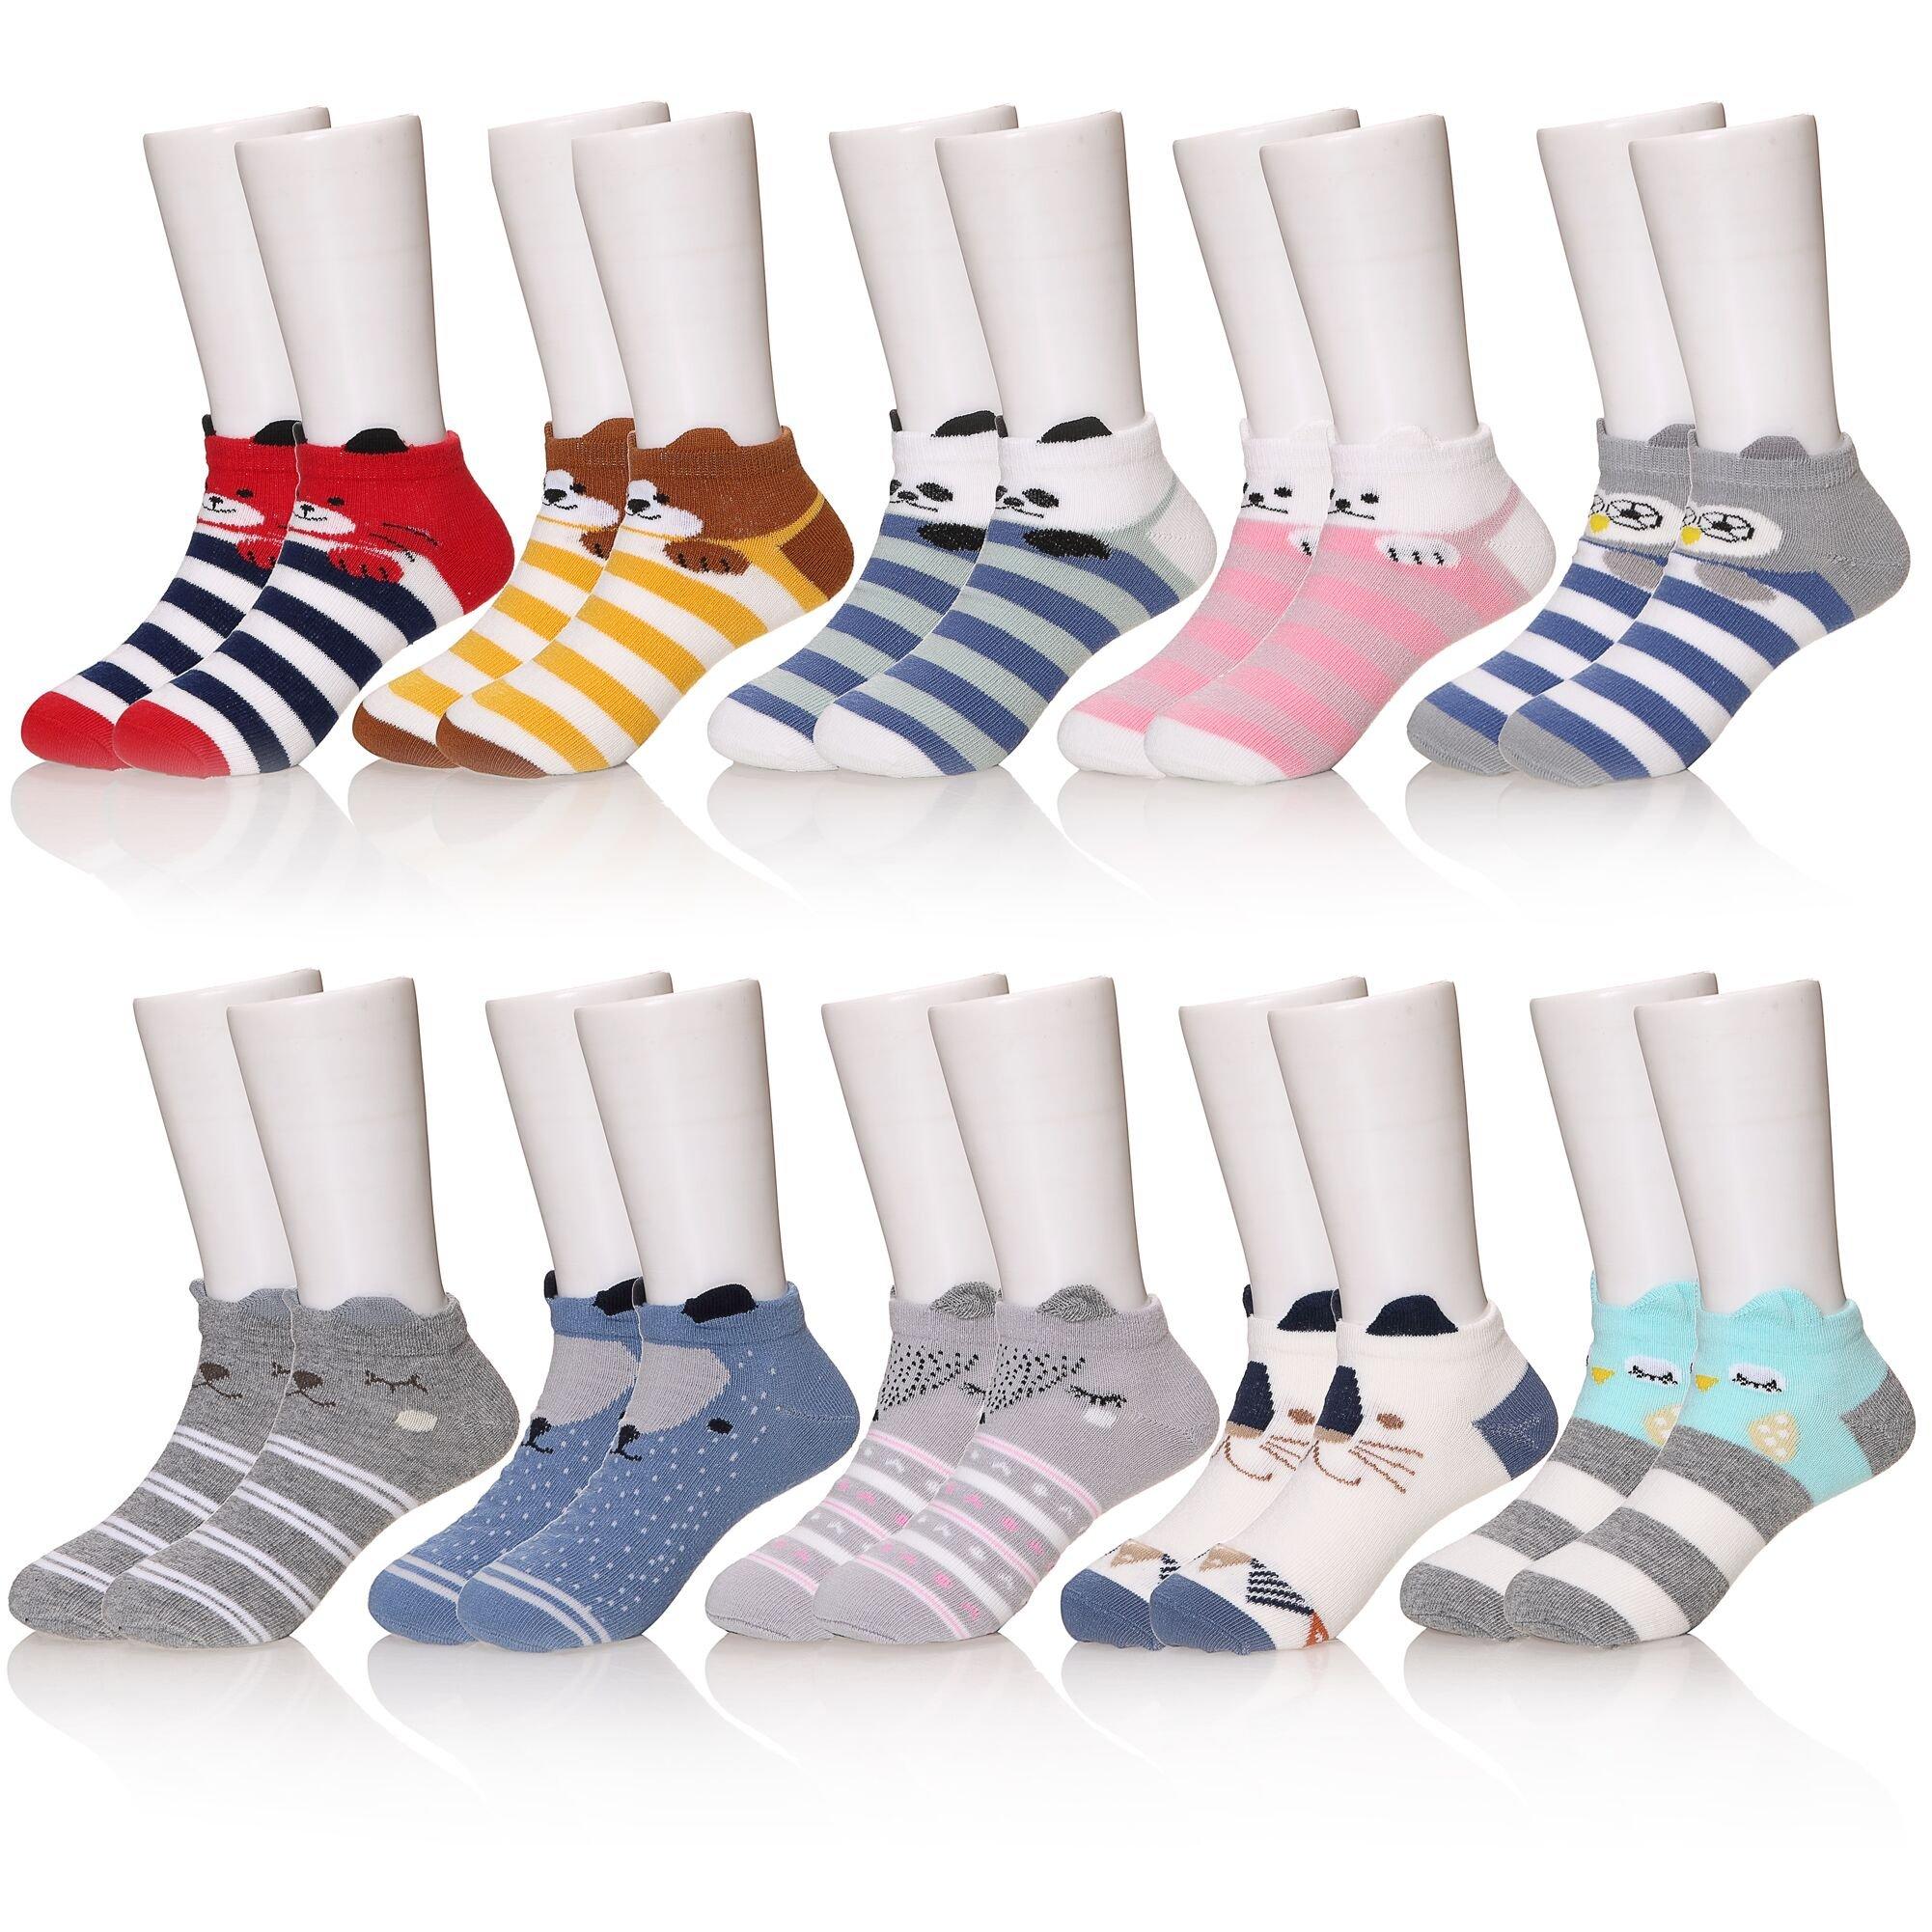 KAKAYAO 10 Pairs Baby Kids Girls Boys Toddler Socks Soft Breathable Cute Cotton Socks(Cartoon 1, S(1-3 Year))